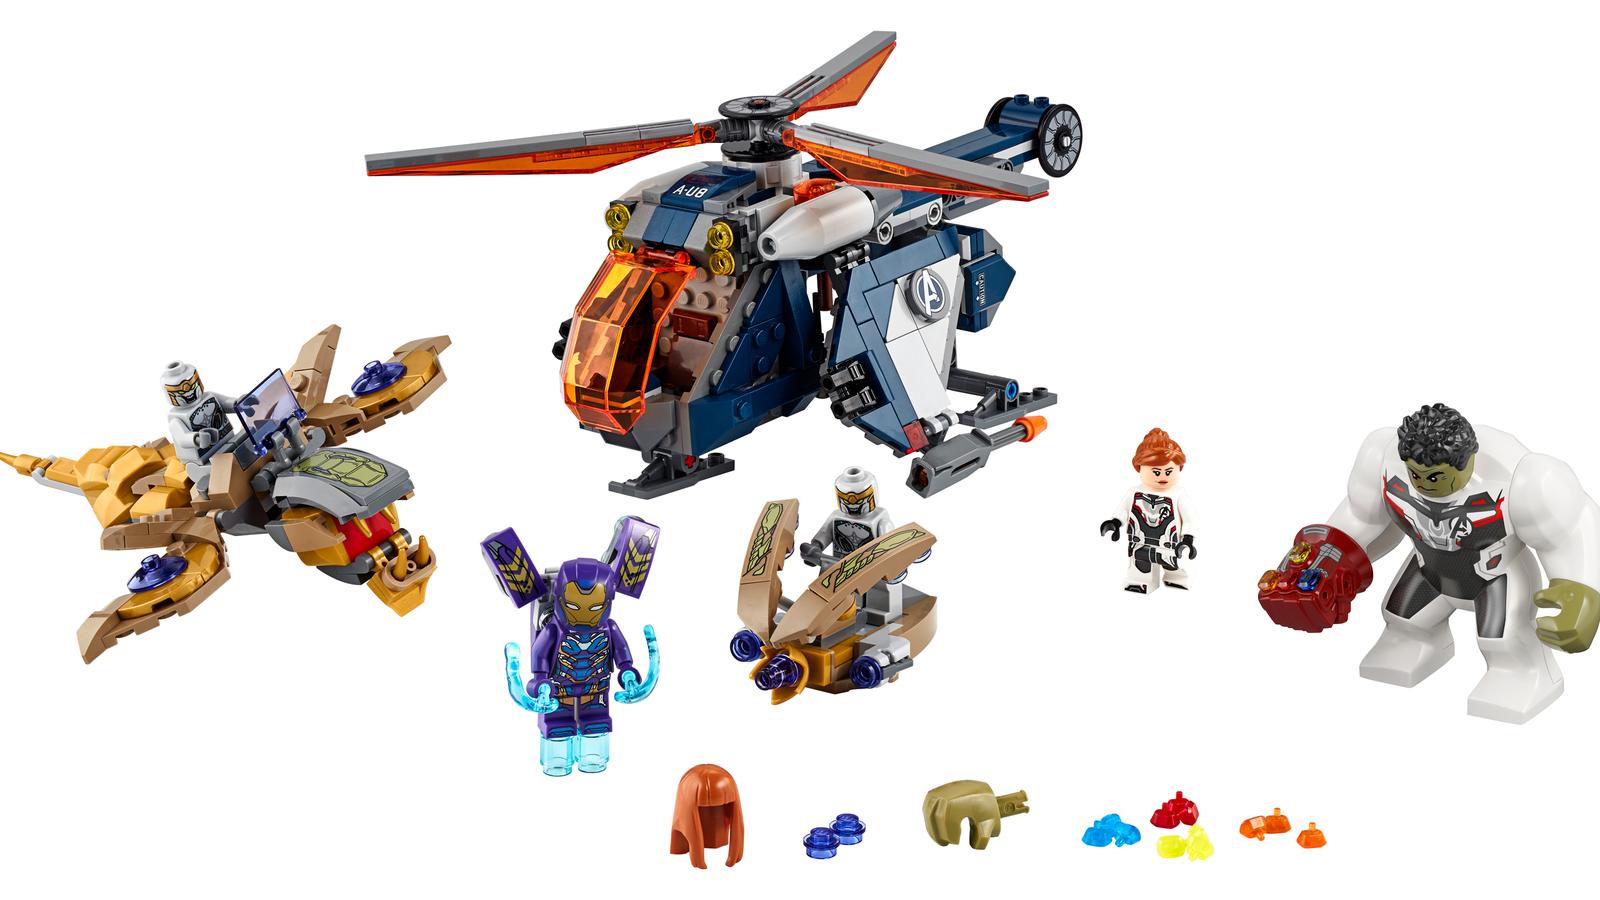 New Lego Marvel Sets 2020 Exclusive: Lego's New Avengers: Endgame Set, Black Widow & Hulk